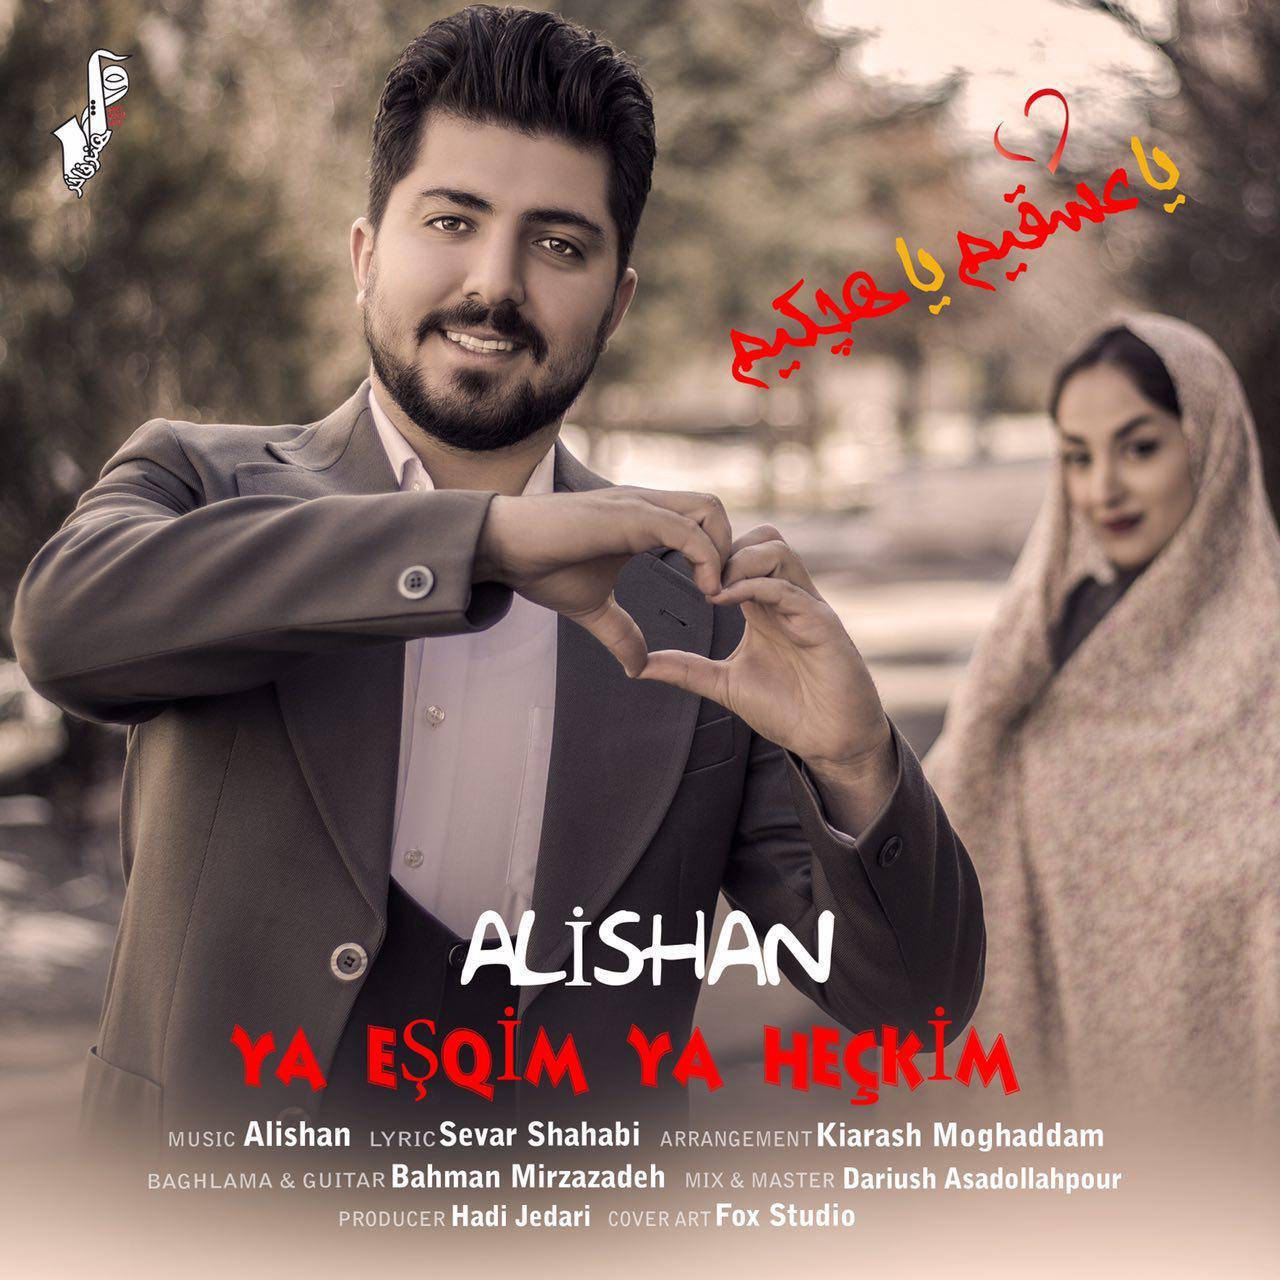 Alishan - Ya Eshgim Ya Hechkim